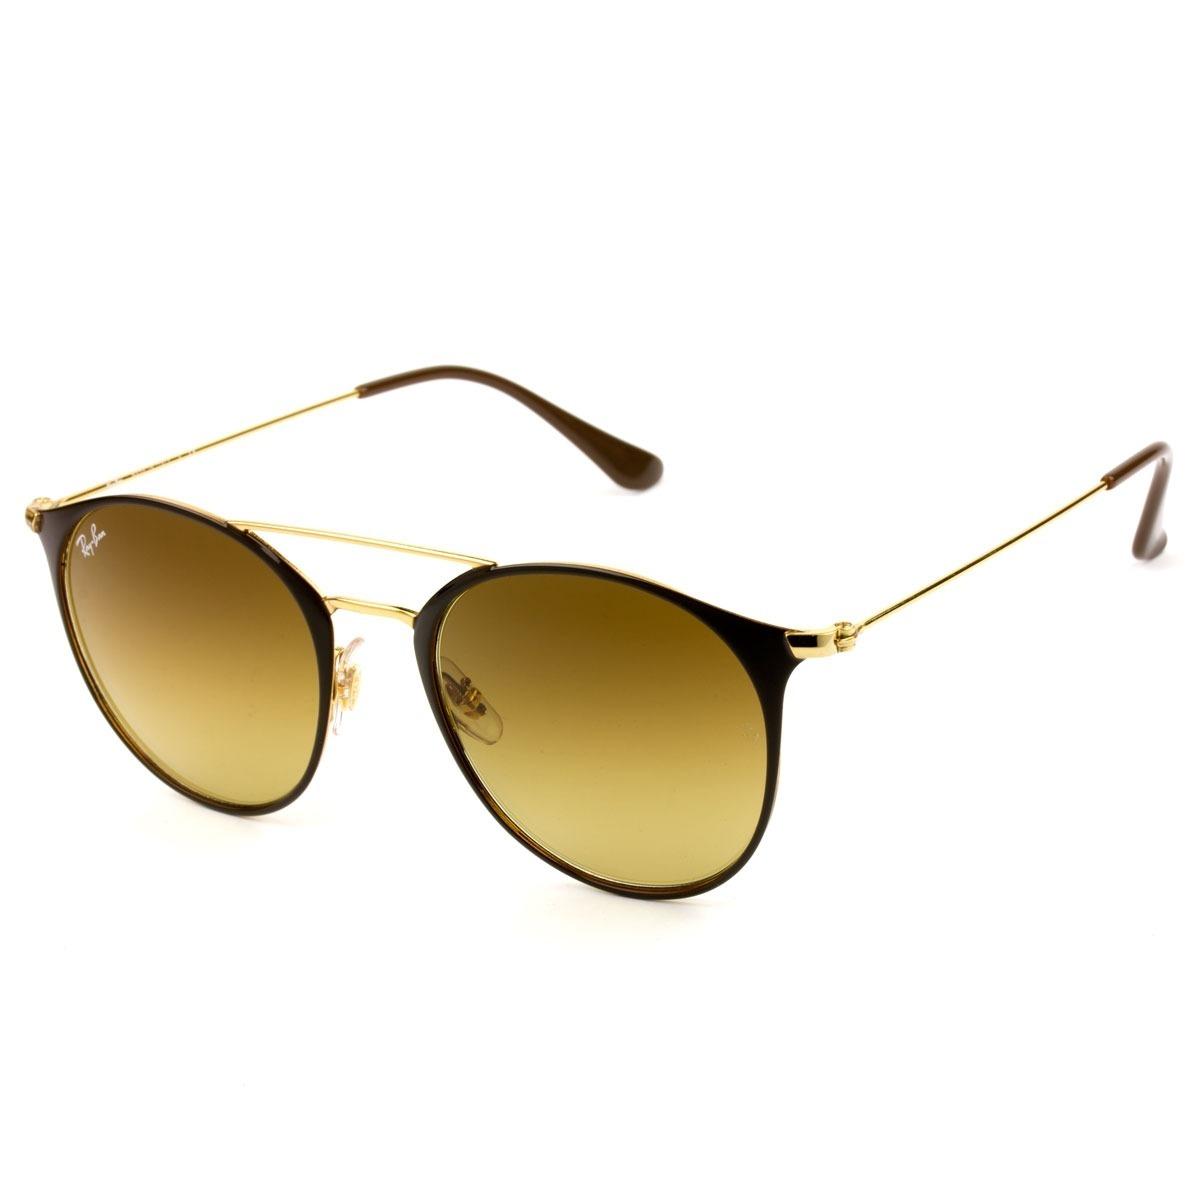 Óculos De Sol Ray-ban Rb3546 9009 85 Original - R  574,10 em Mercado ... 14661b5db20e